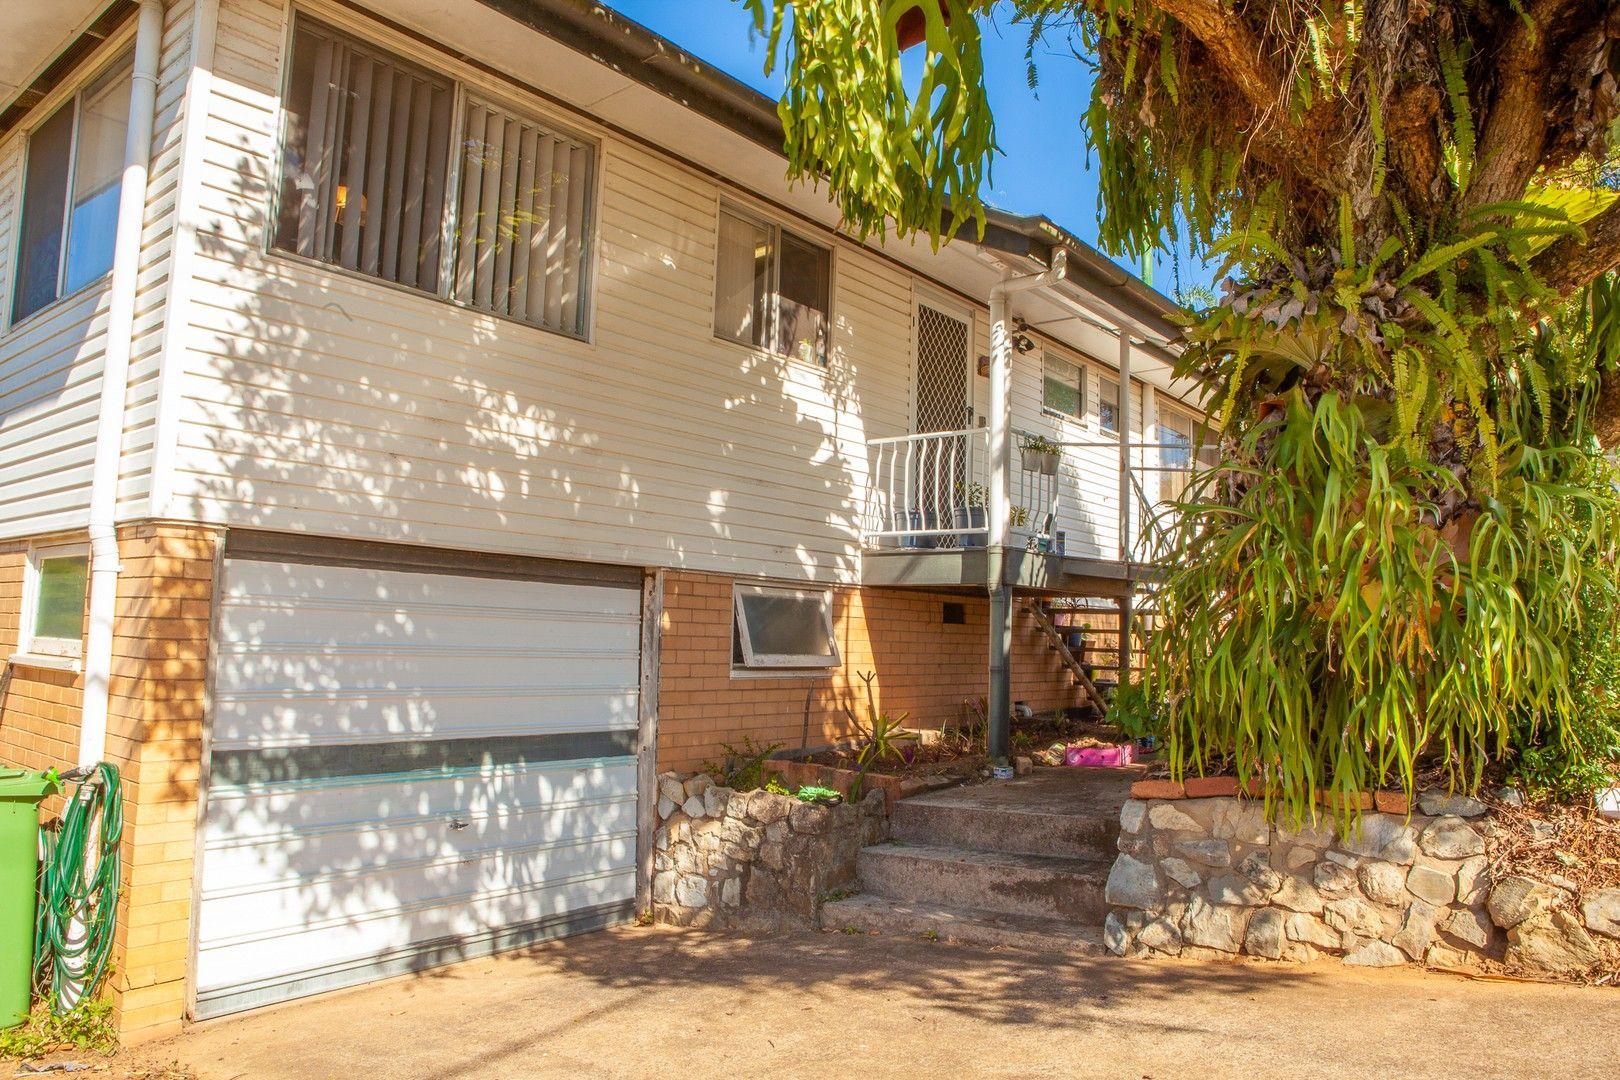 3 bedrooms House in 11 Baloo Street BURNSIDE QLD, 4560